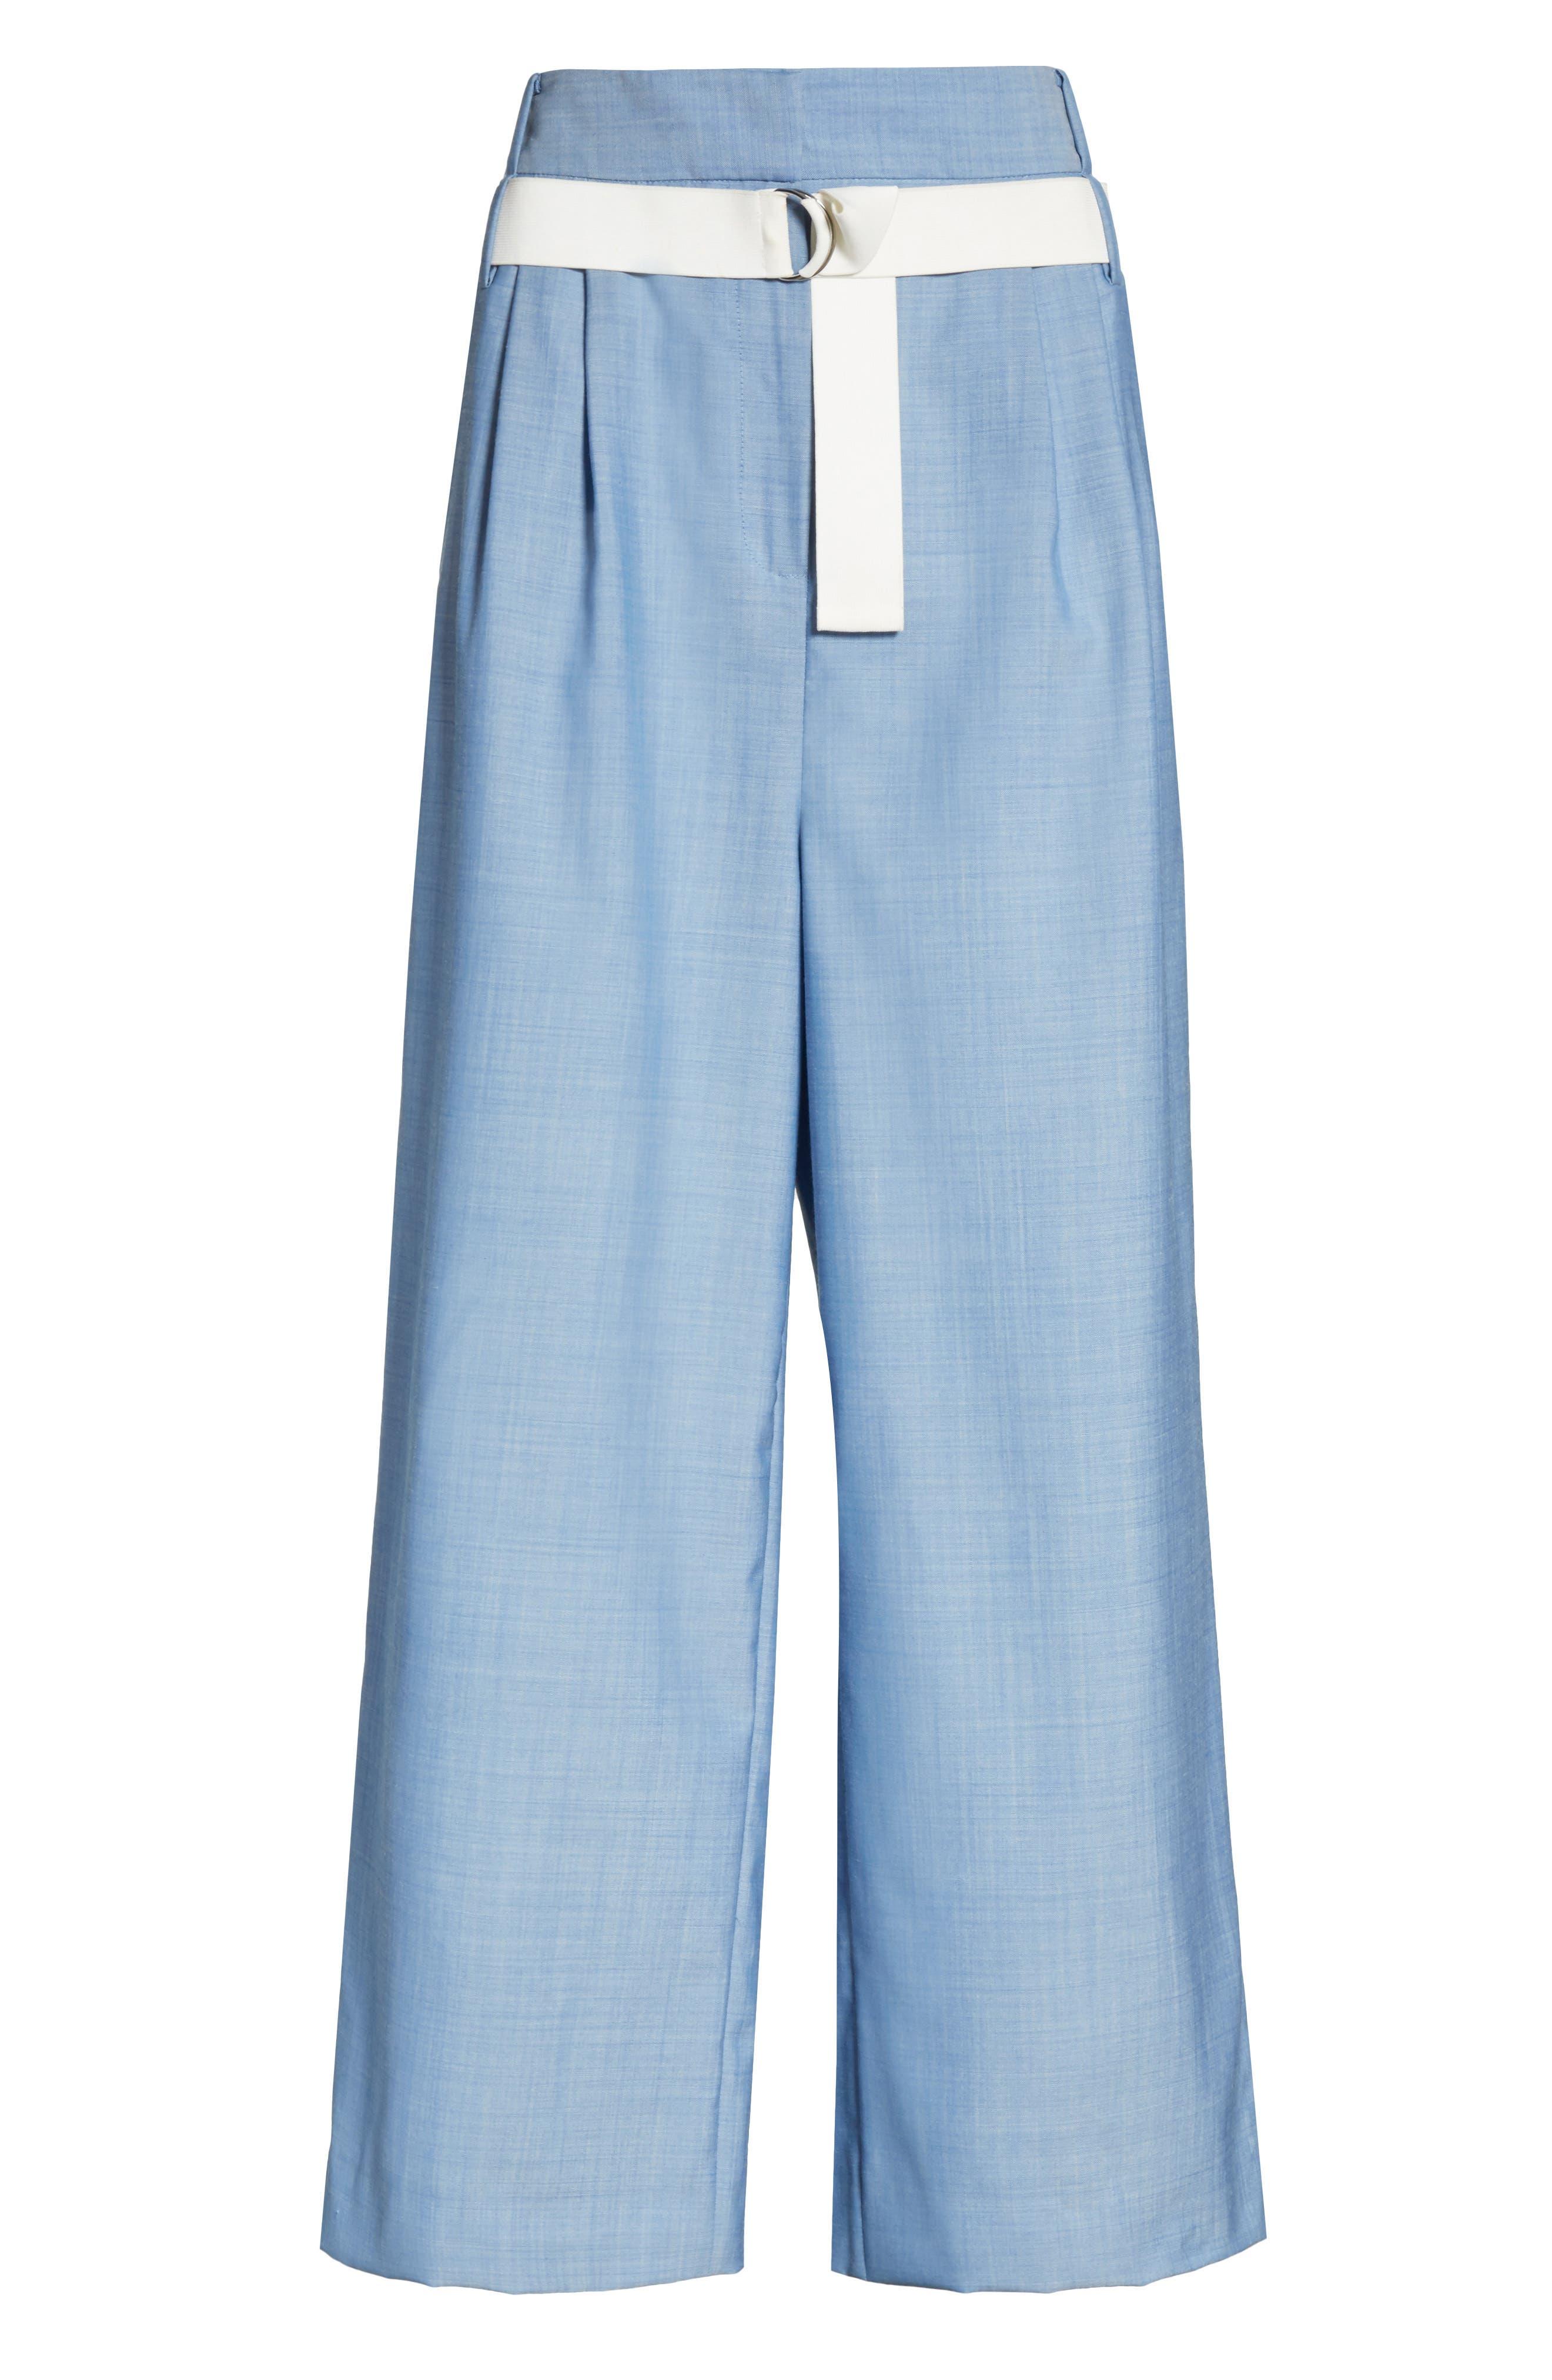 Belted Wide Leg Crop Pants,                             Alternate thumbnail 6, color,